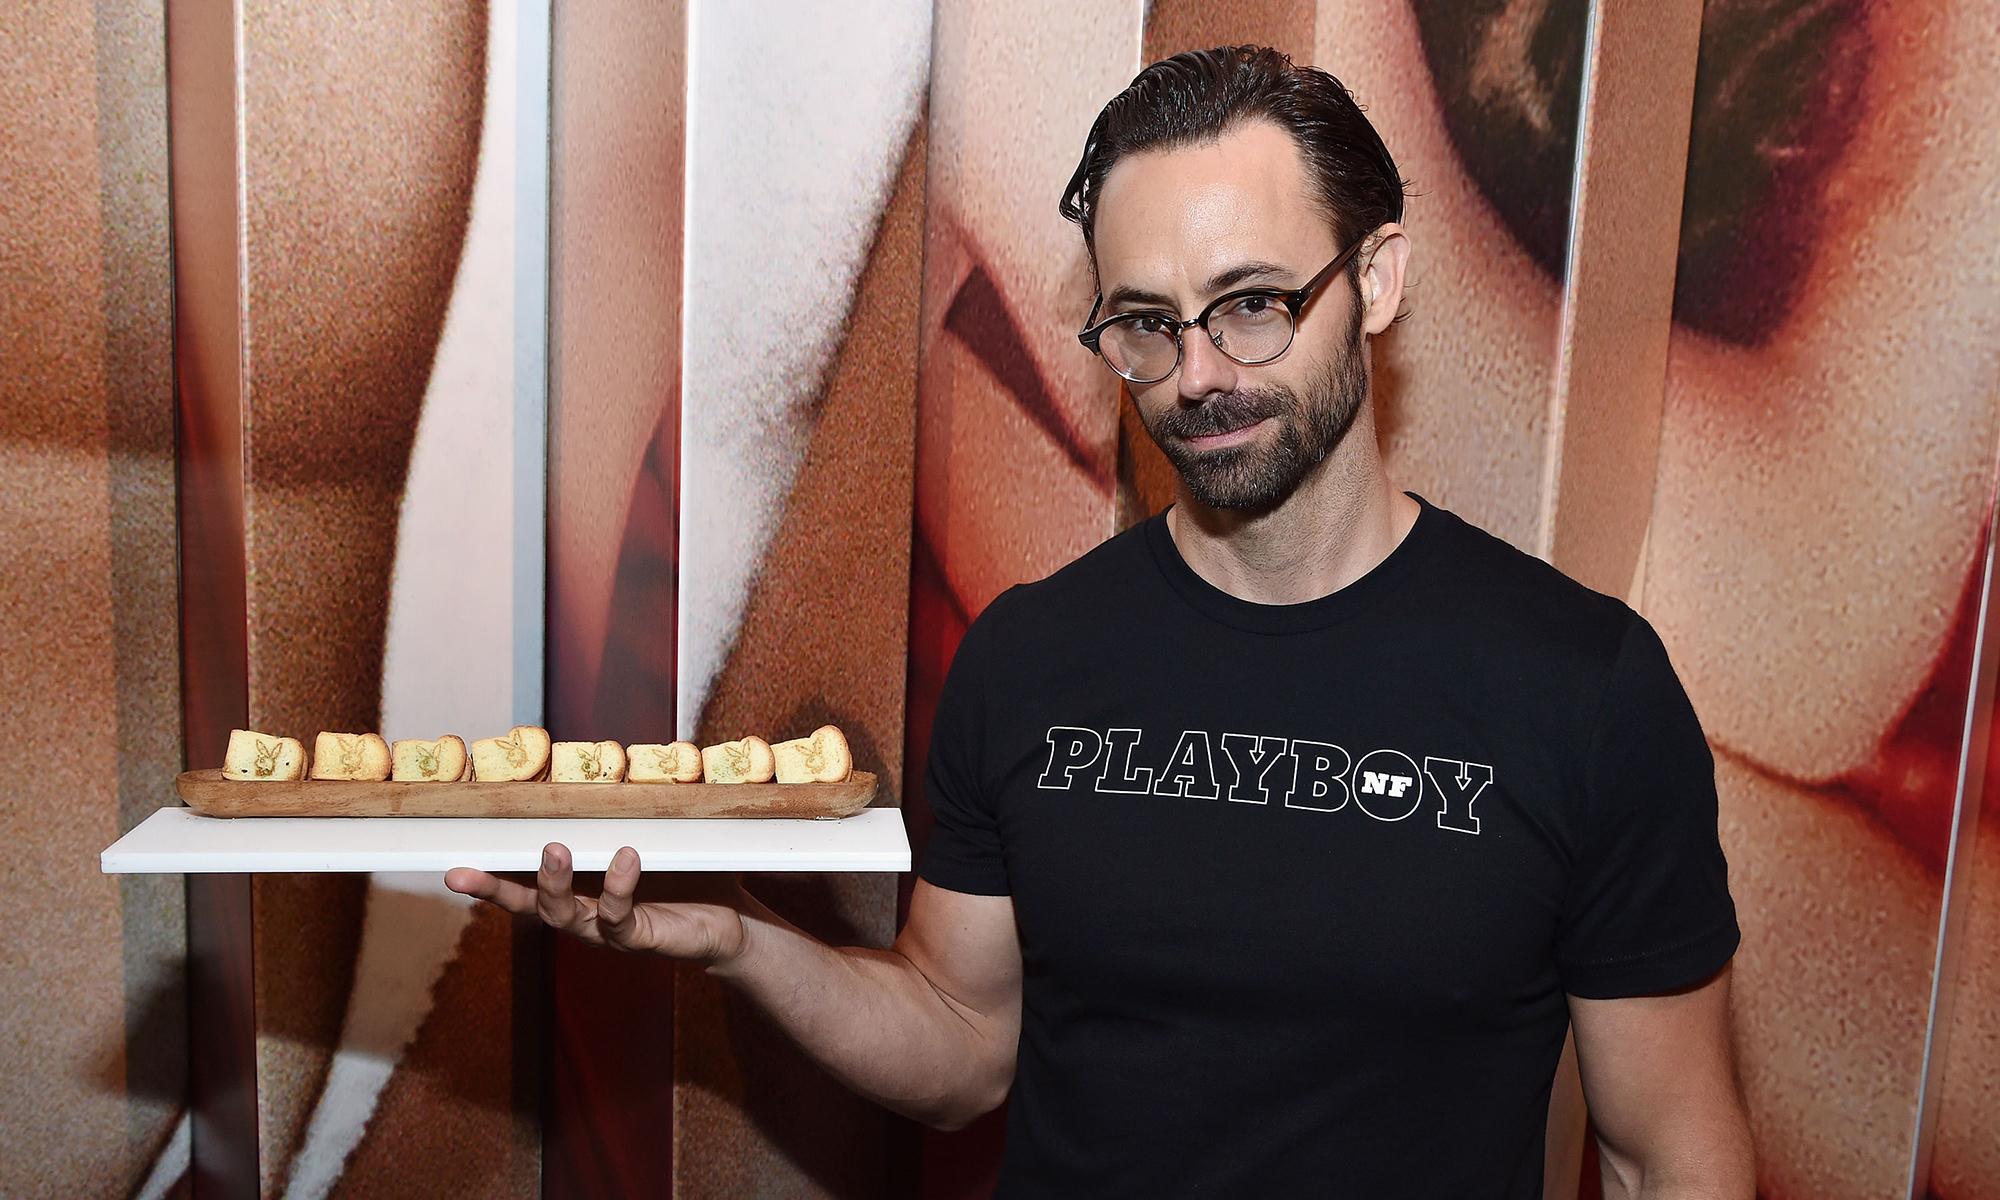 Playboy-NF-Toast